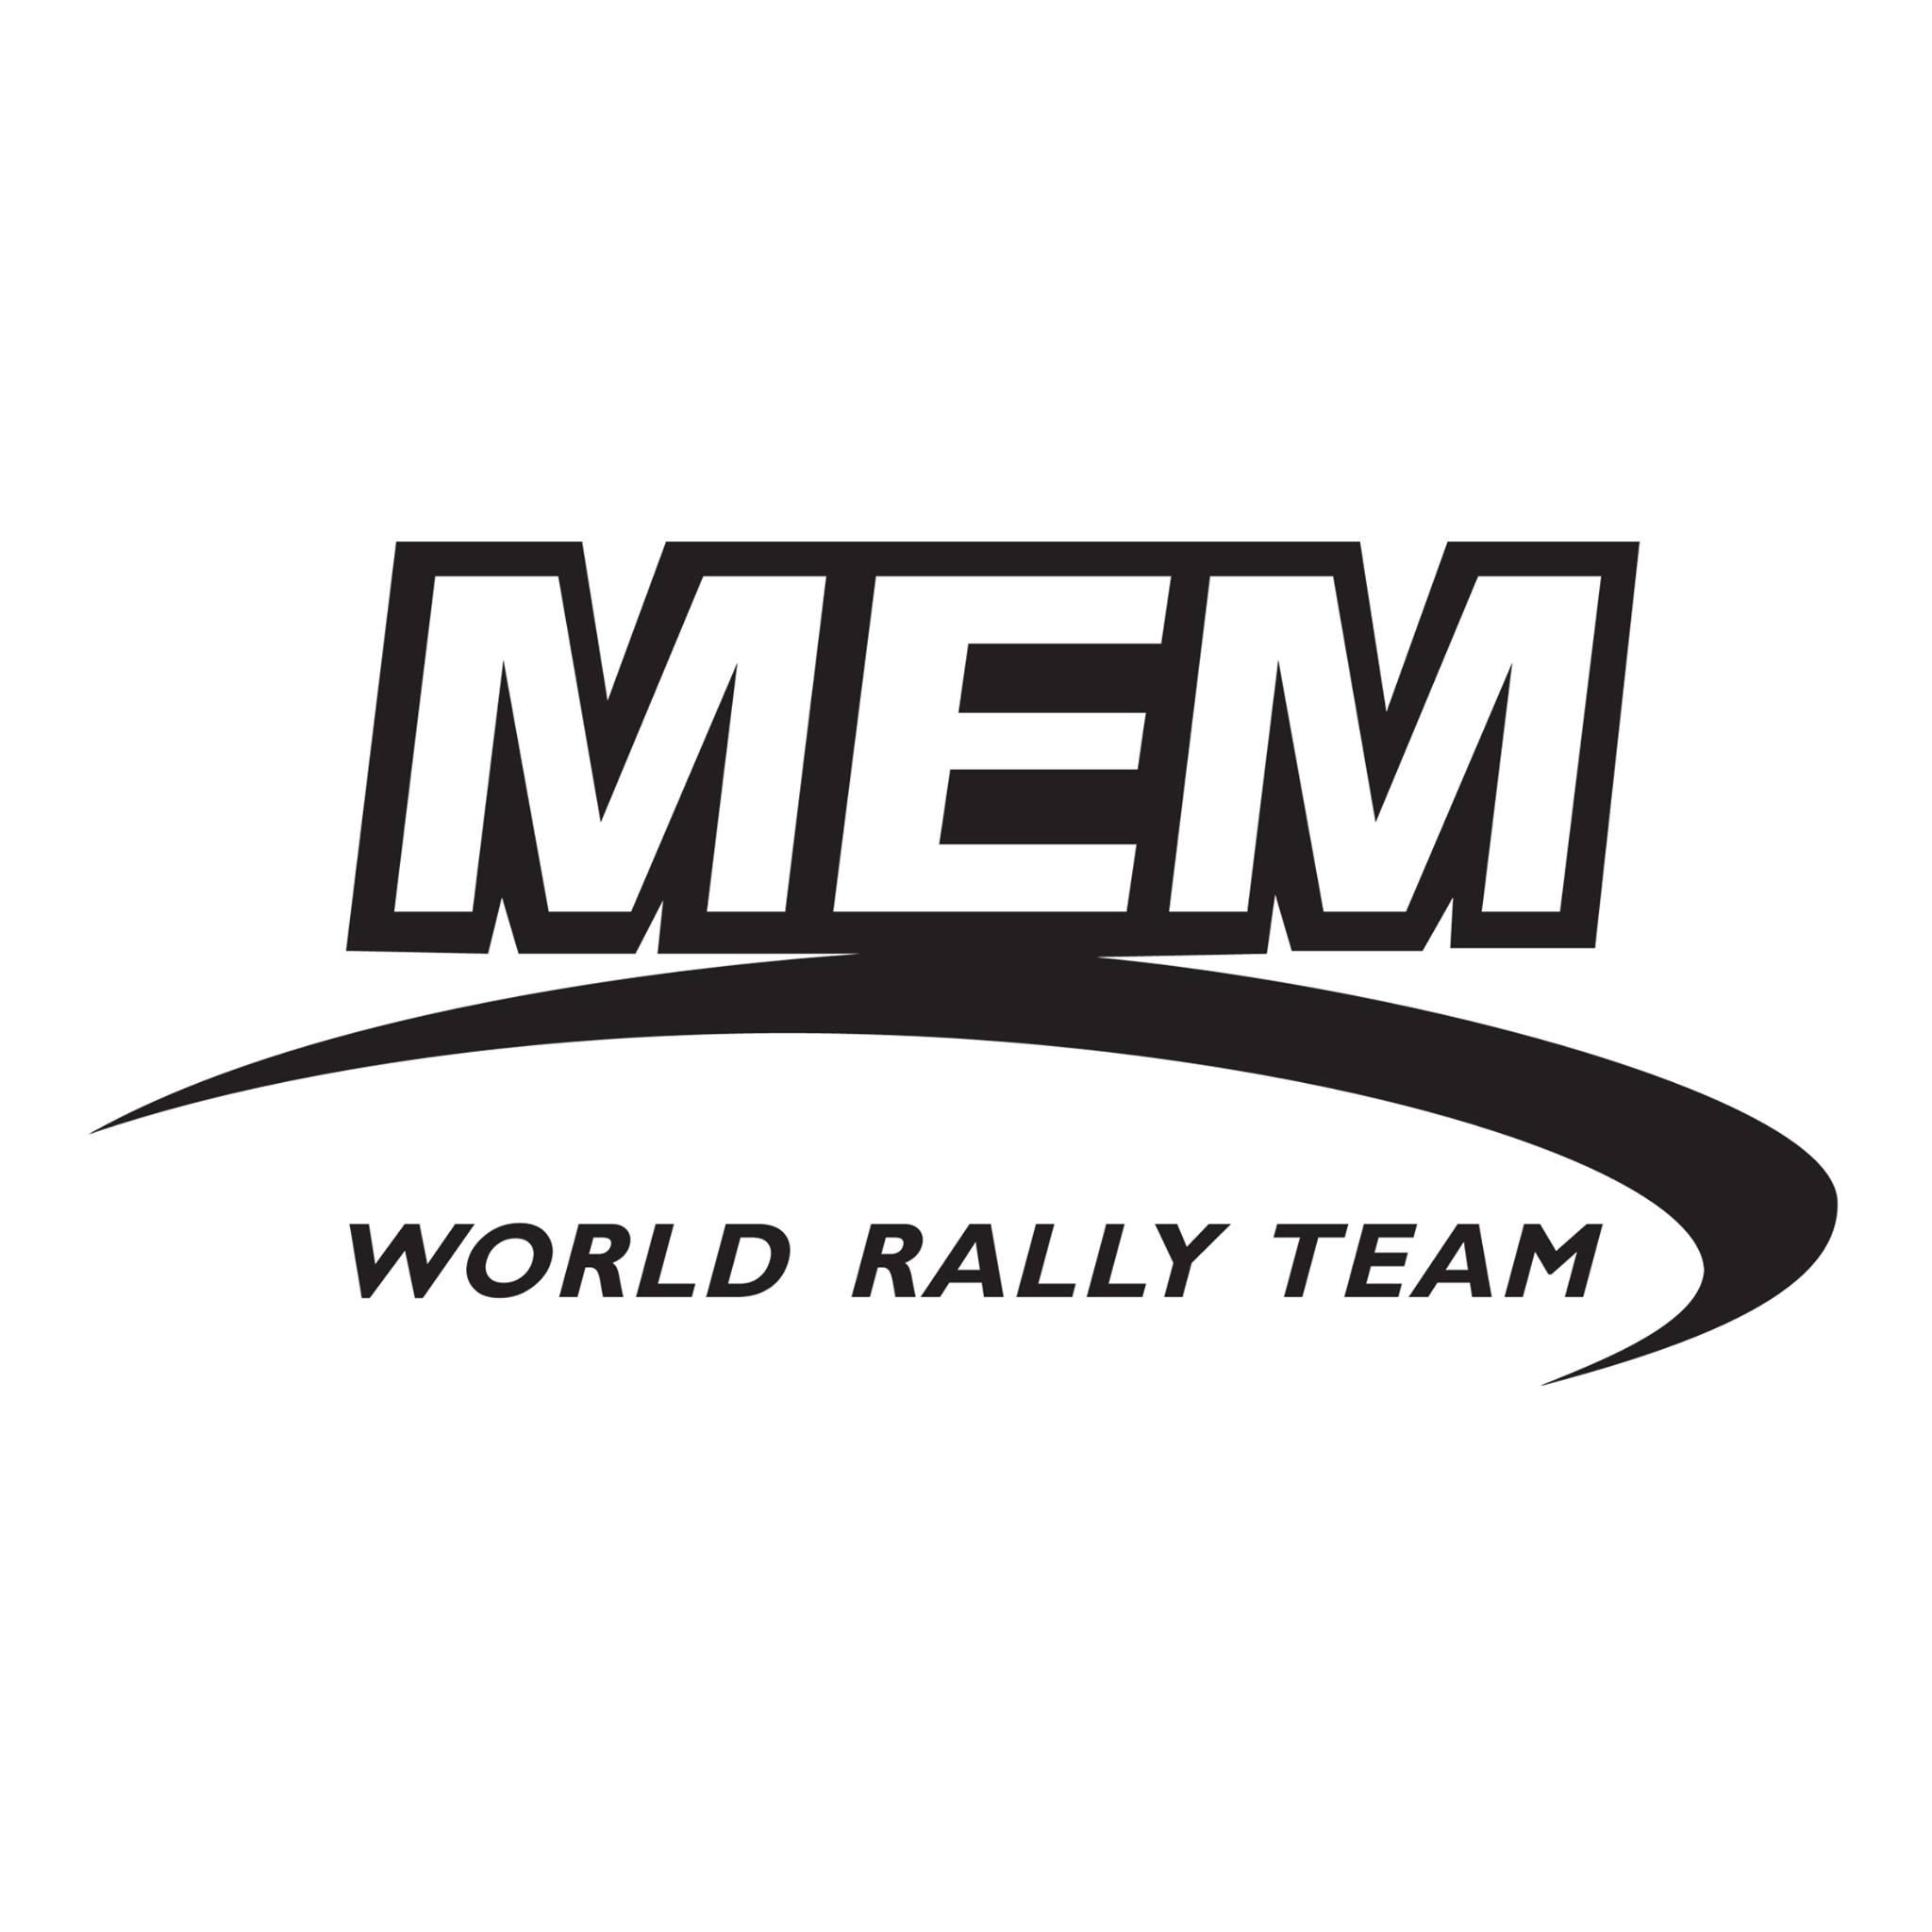 Logo Mellors Elliot Motorsport